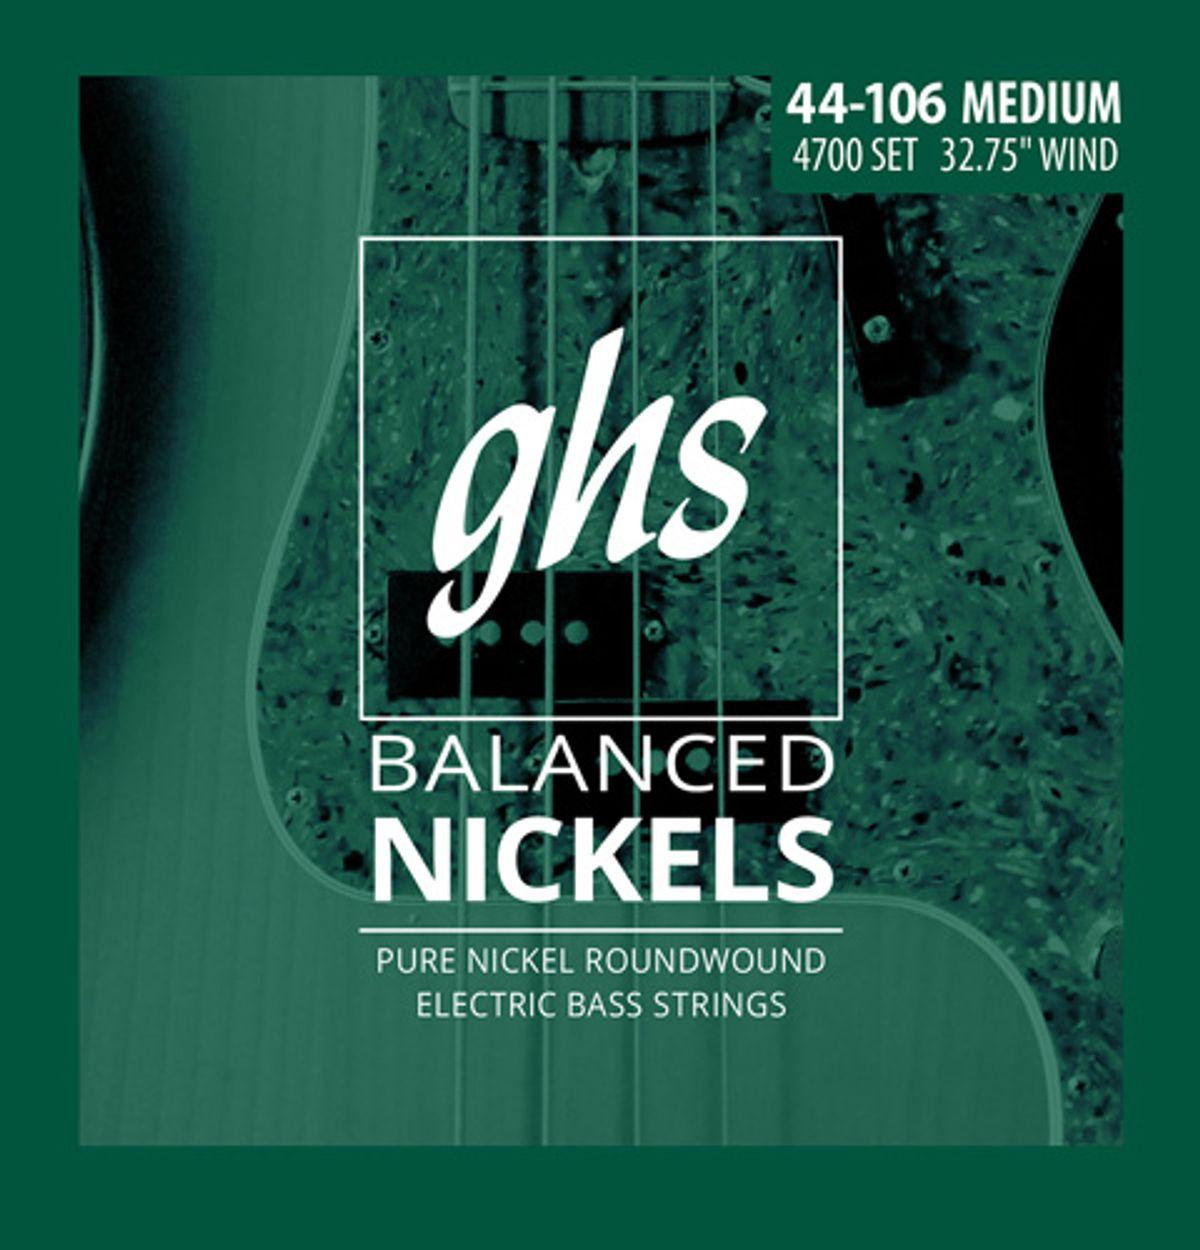 GHS Unveils Balanced Nickel Bass Strings